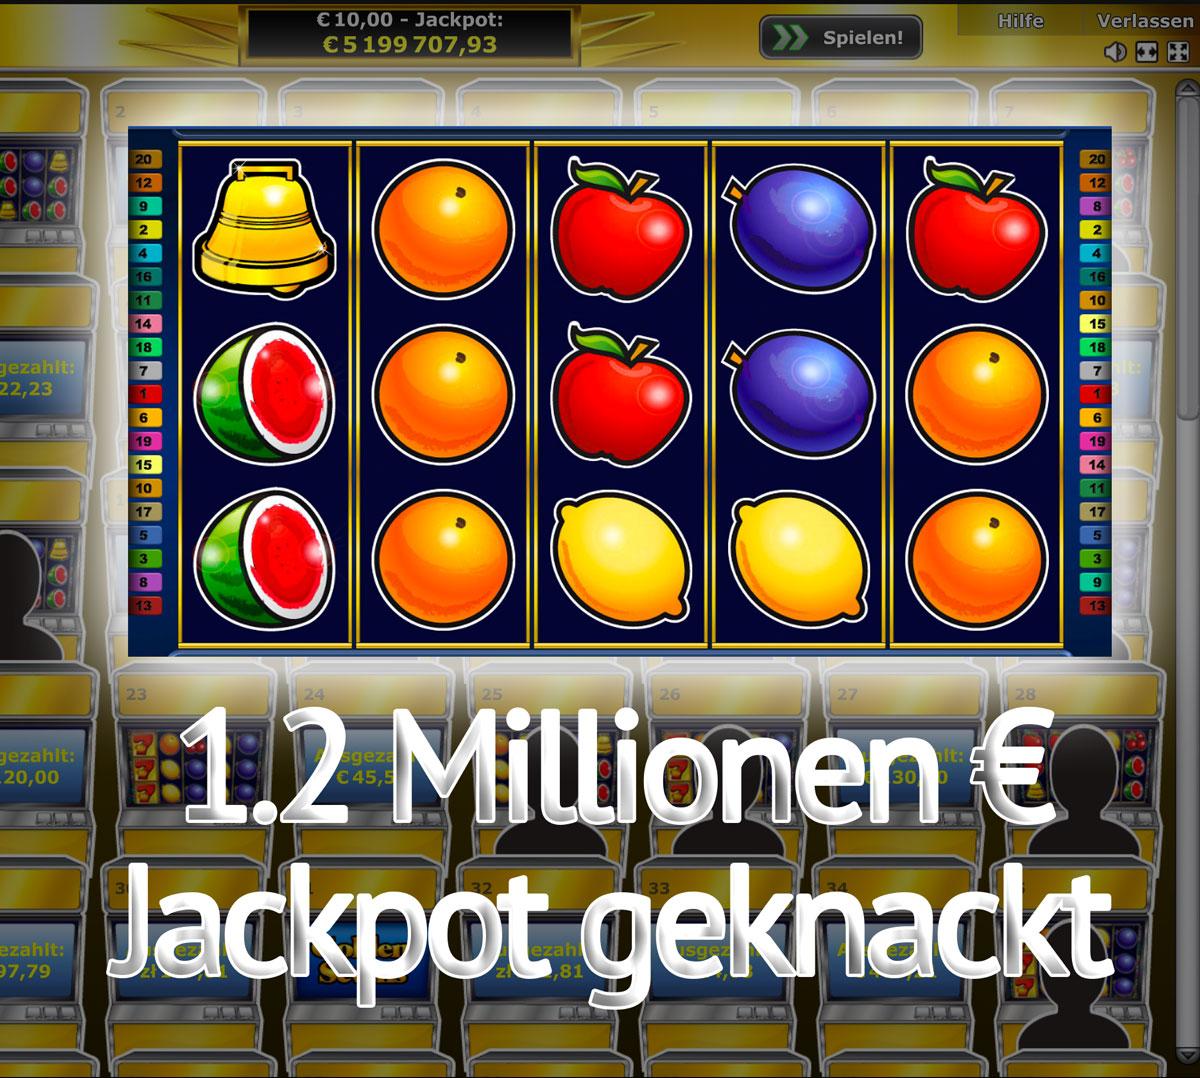 Casino Euro gewonnen 678968